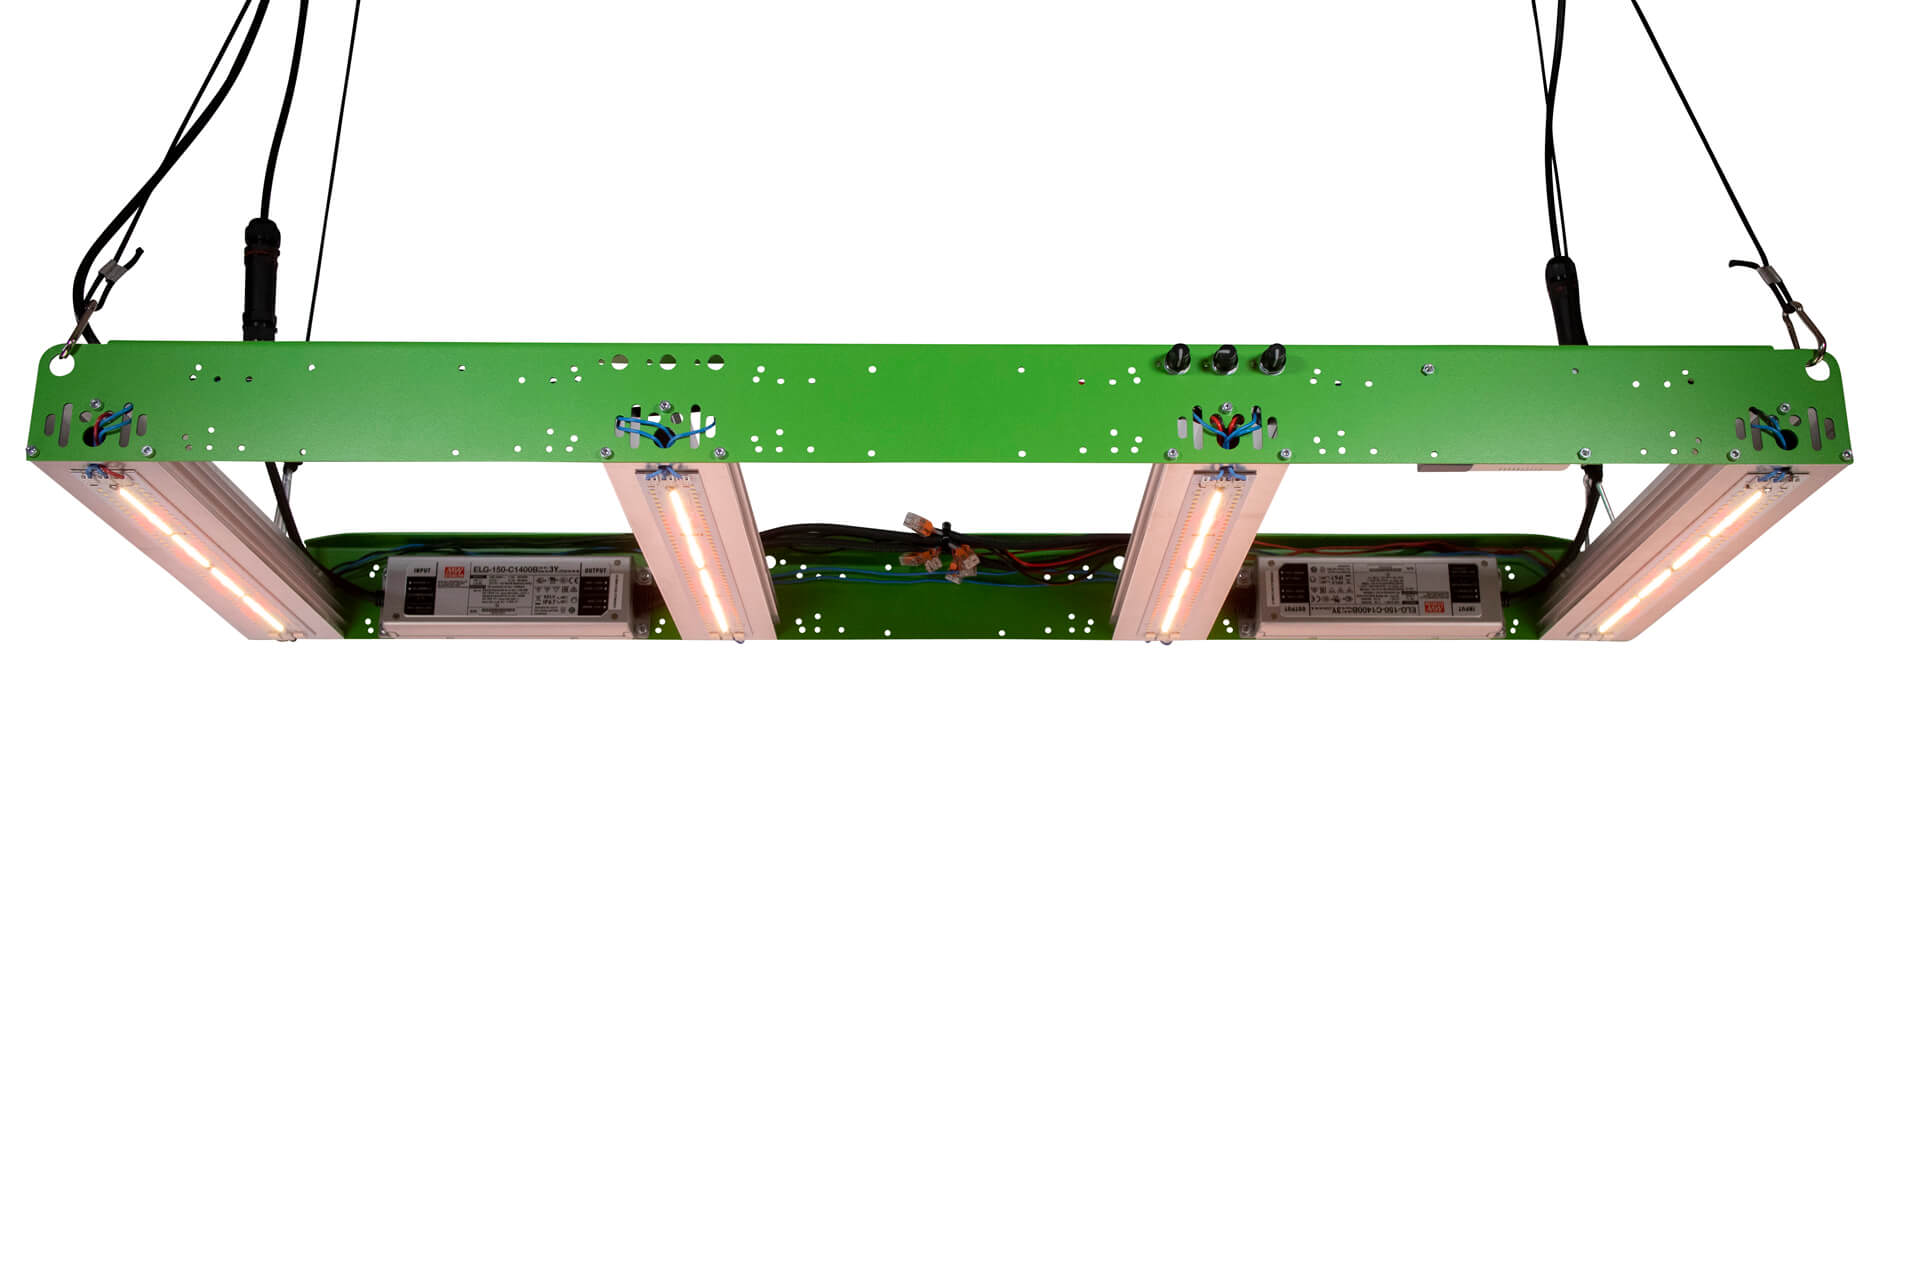 DIY-M-KIT-2-series-short-300w-bottom-up-bloom-channel-on-pro-emit